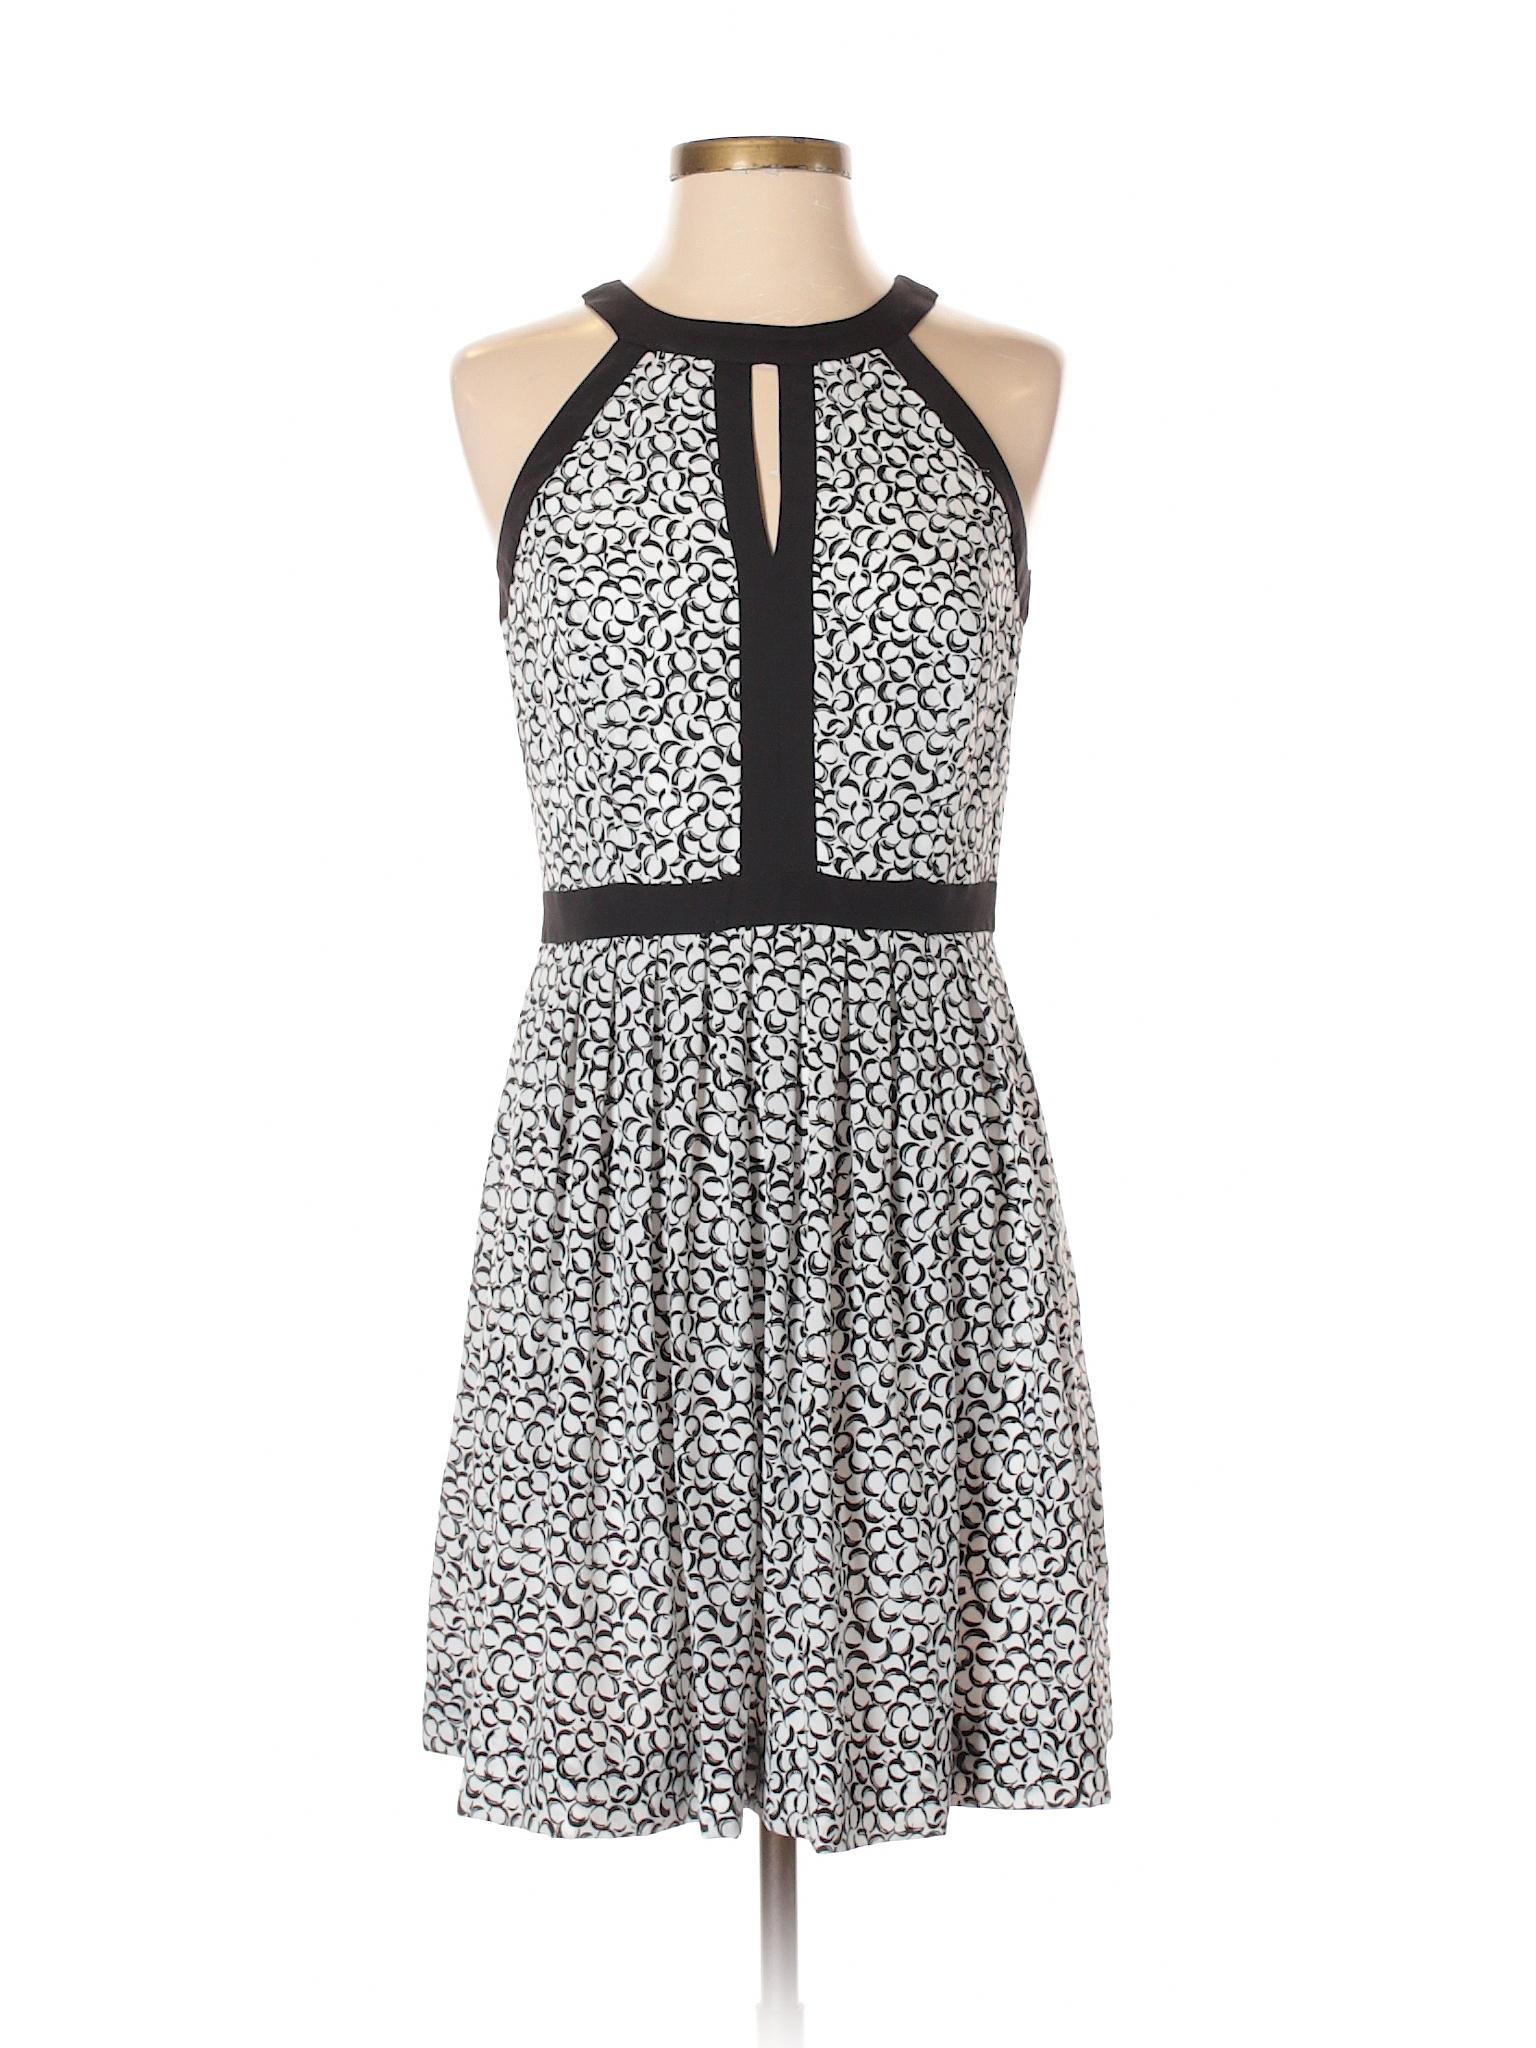 Casual Black Market House White Dress Selling 8qS1II